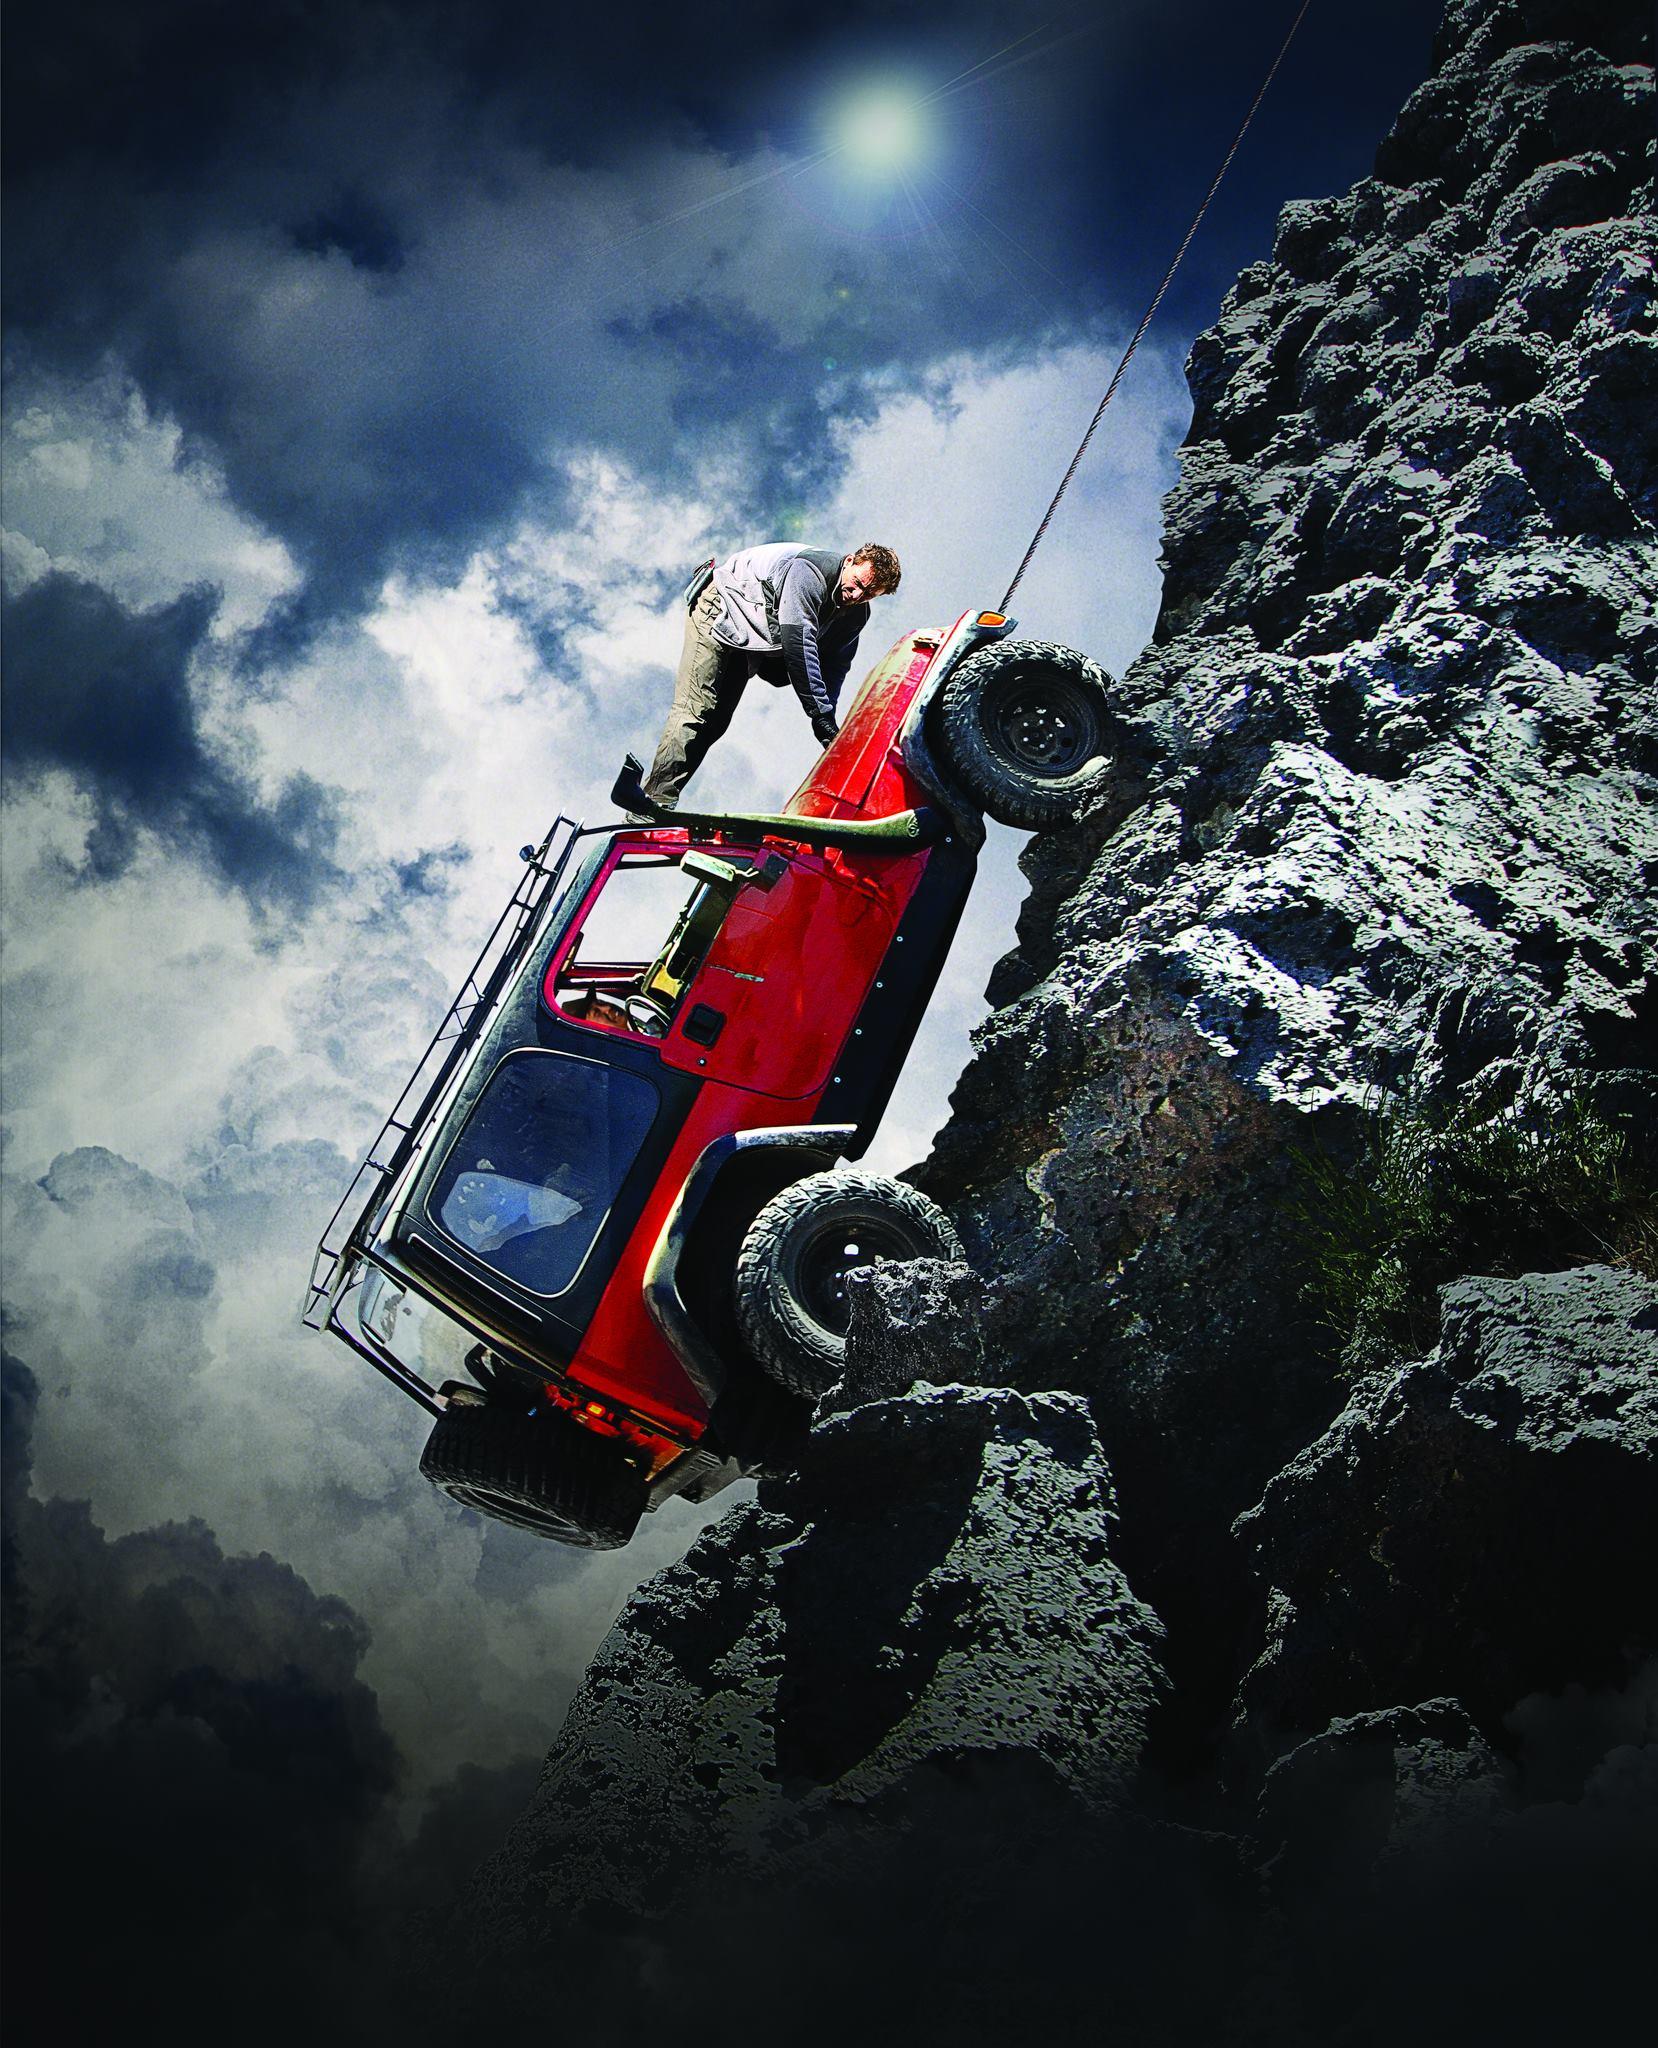 Sanoran Desert Mexico, lava wall climb - 'Car Vs Wild' for Discovery Channel